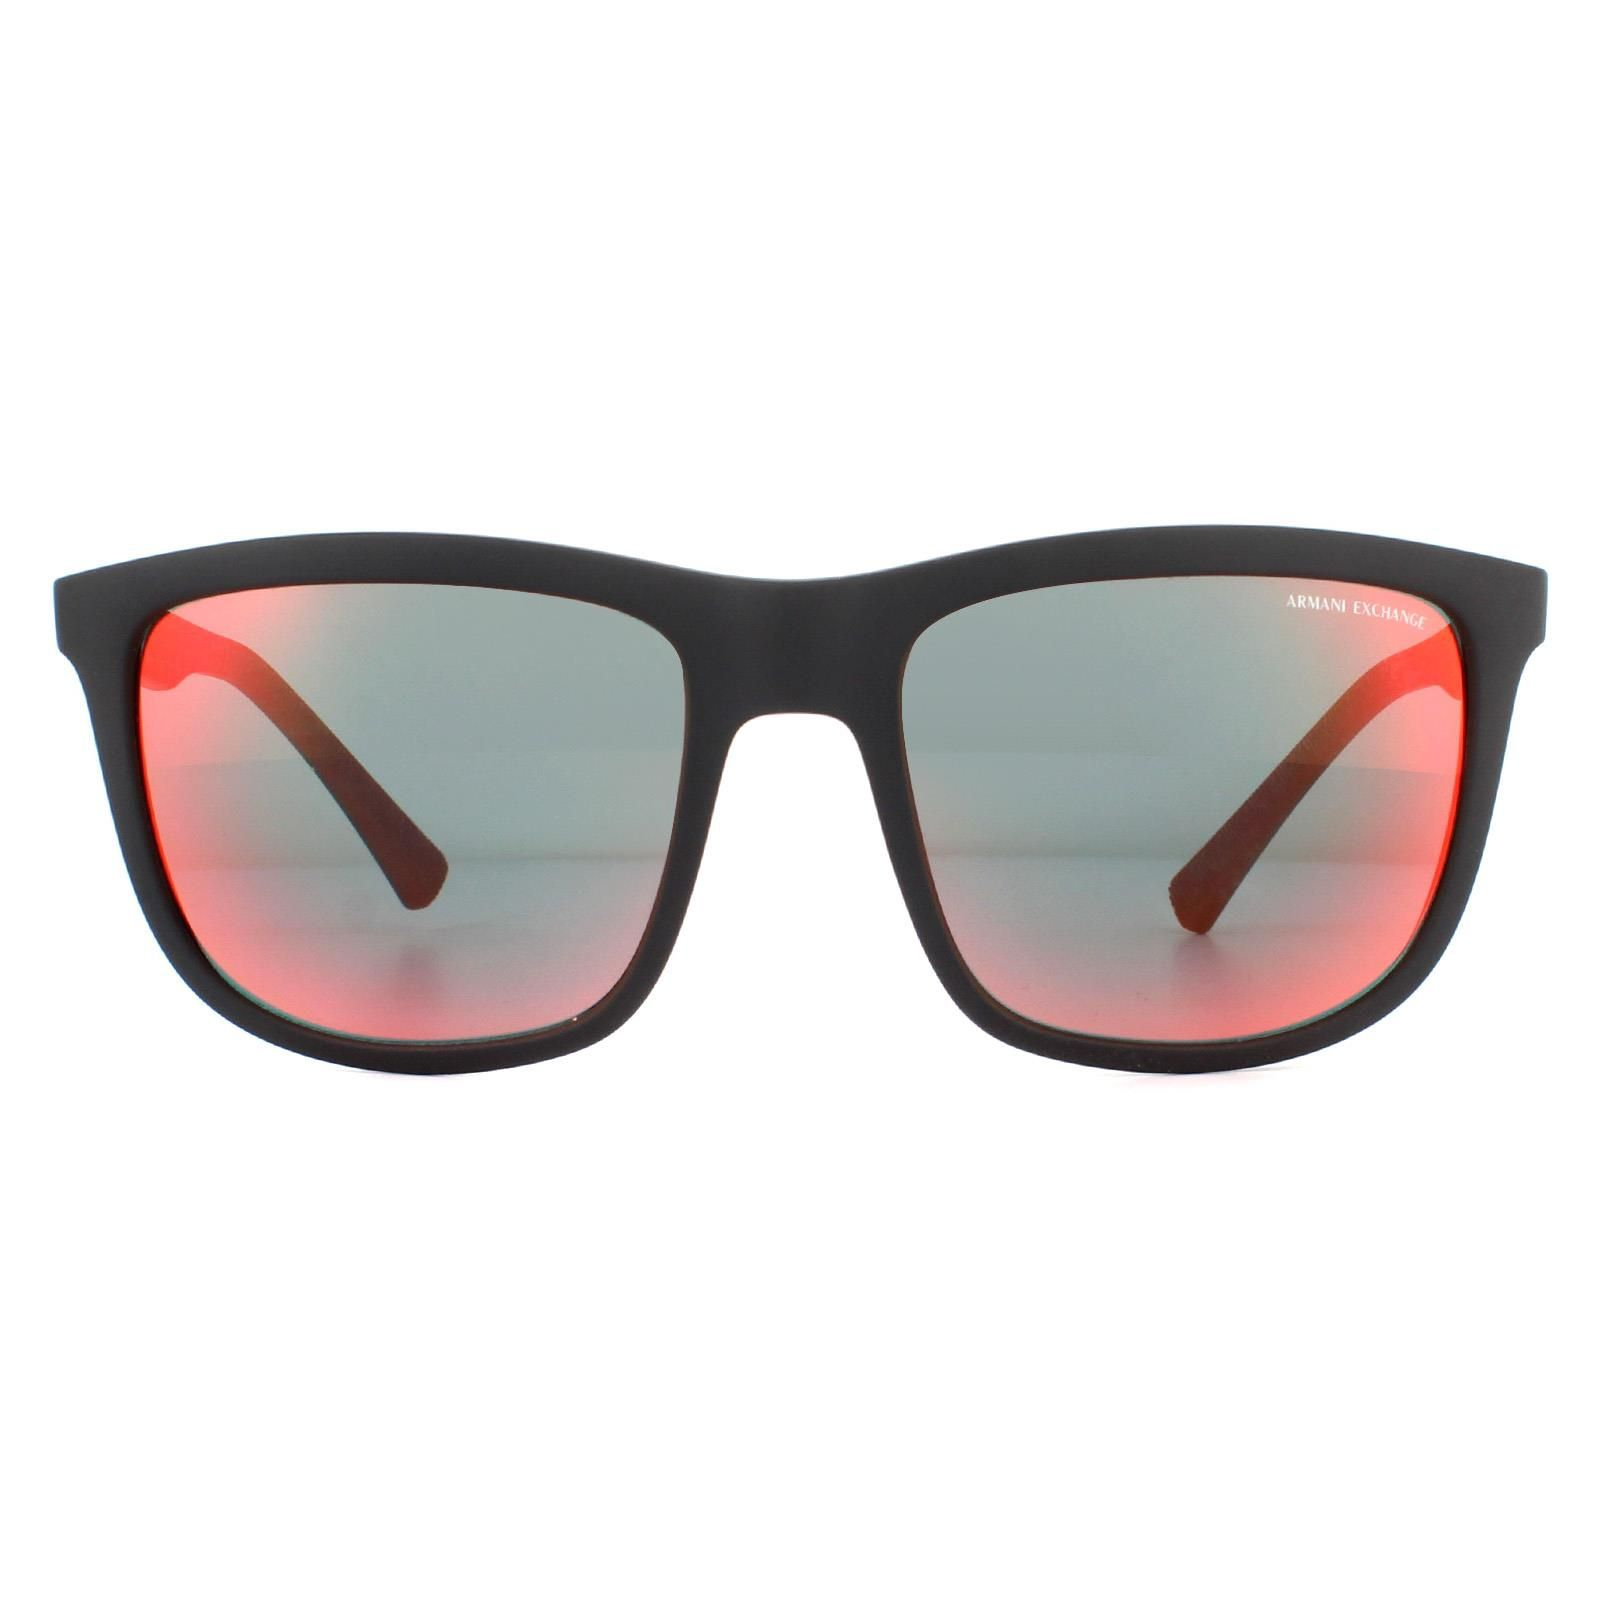 Armani Exchange Sunglasses AX4093S 80786Q Matte Black Grey Orange Yellow Mirror